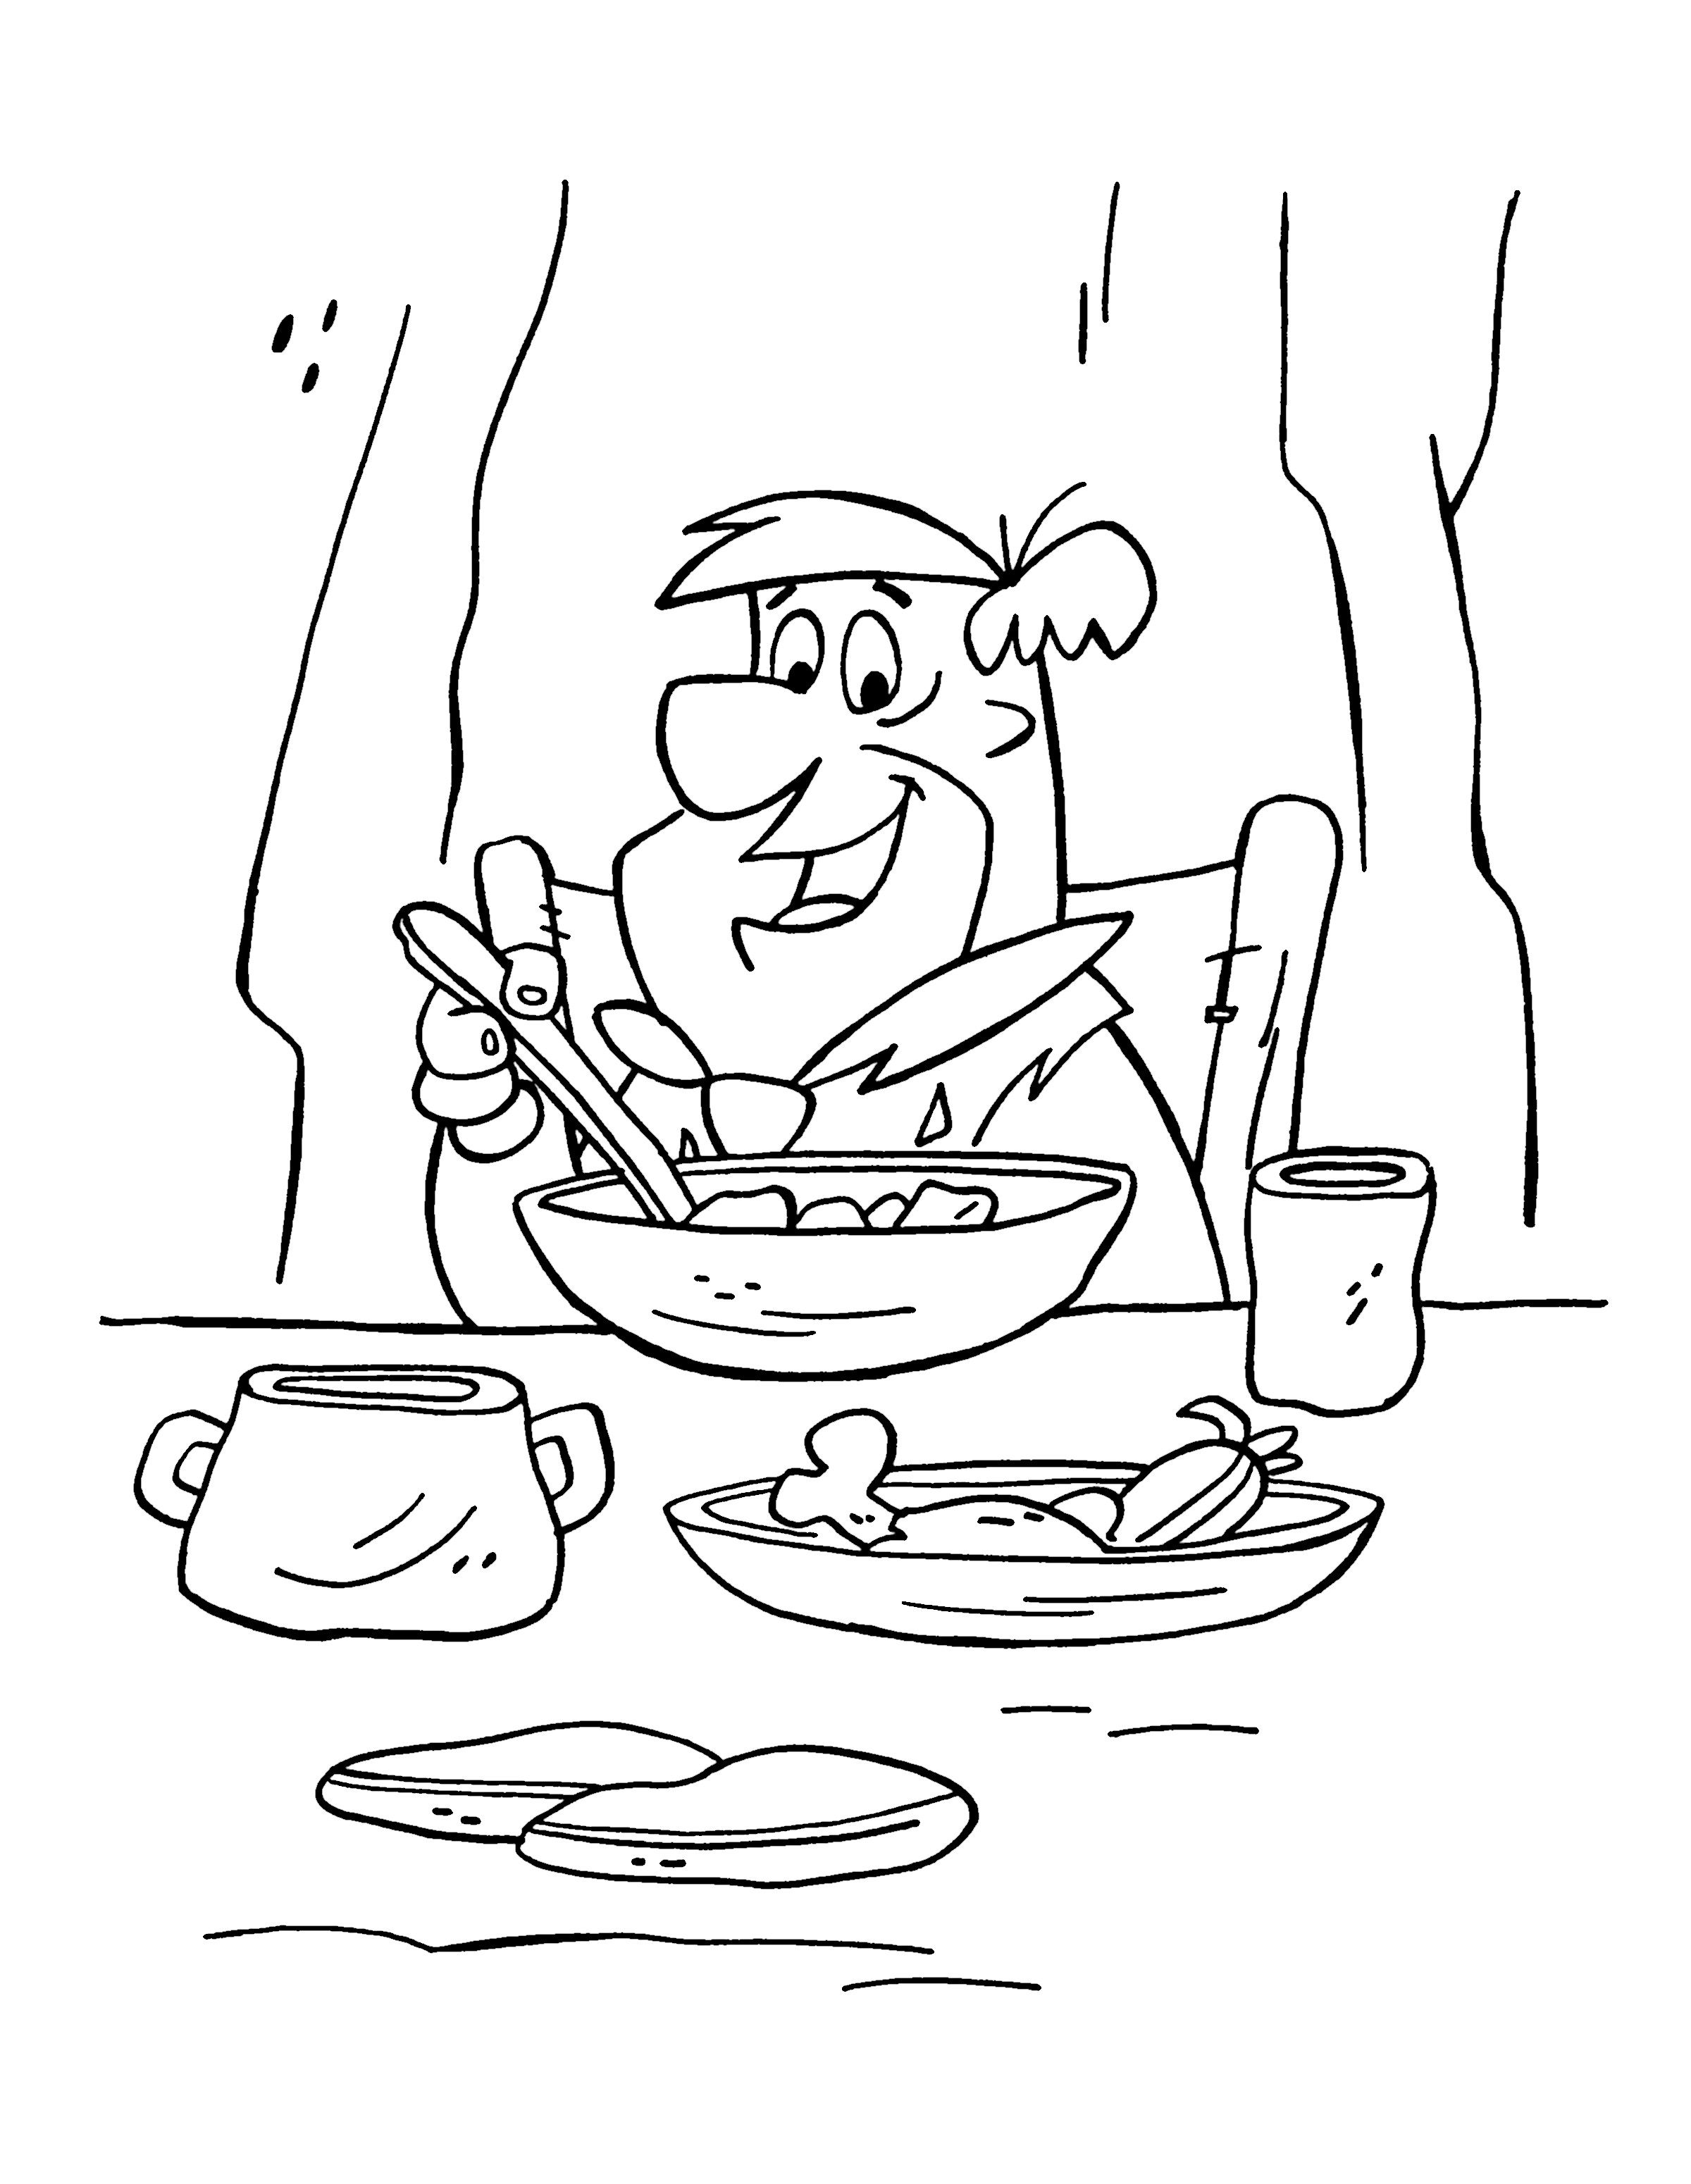 Desenhos para pintar Os Flintstones 20 | Desenhos para Colorir ...